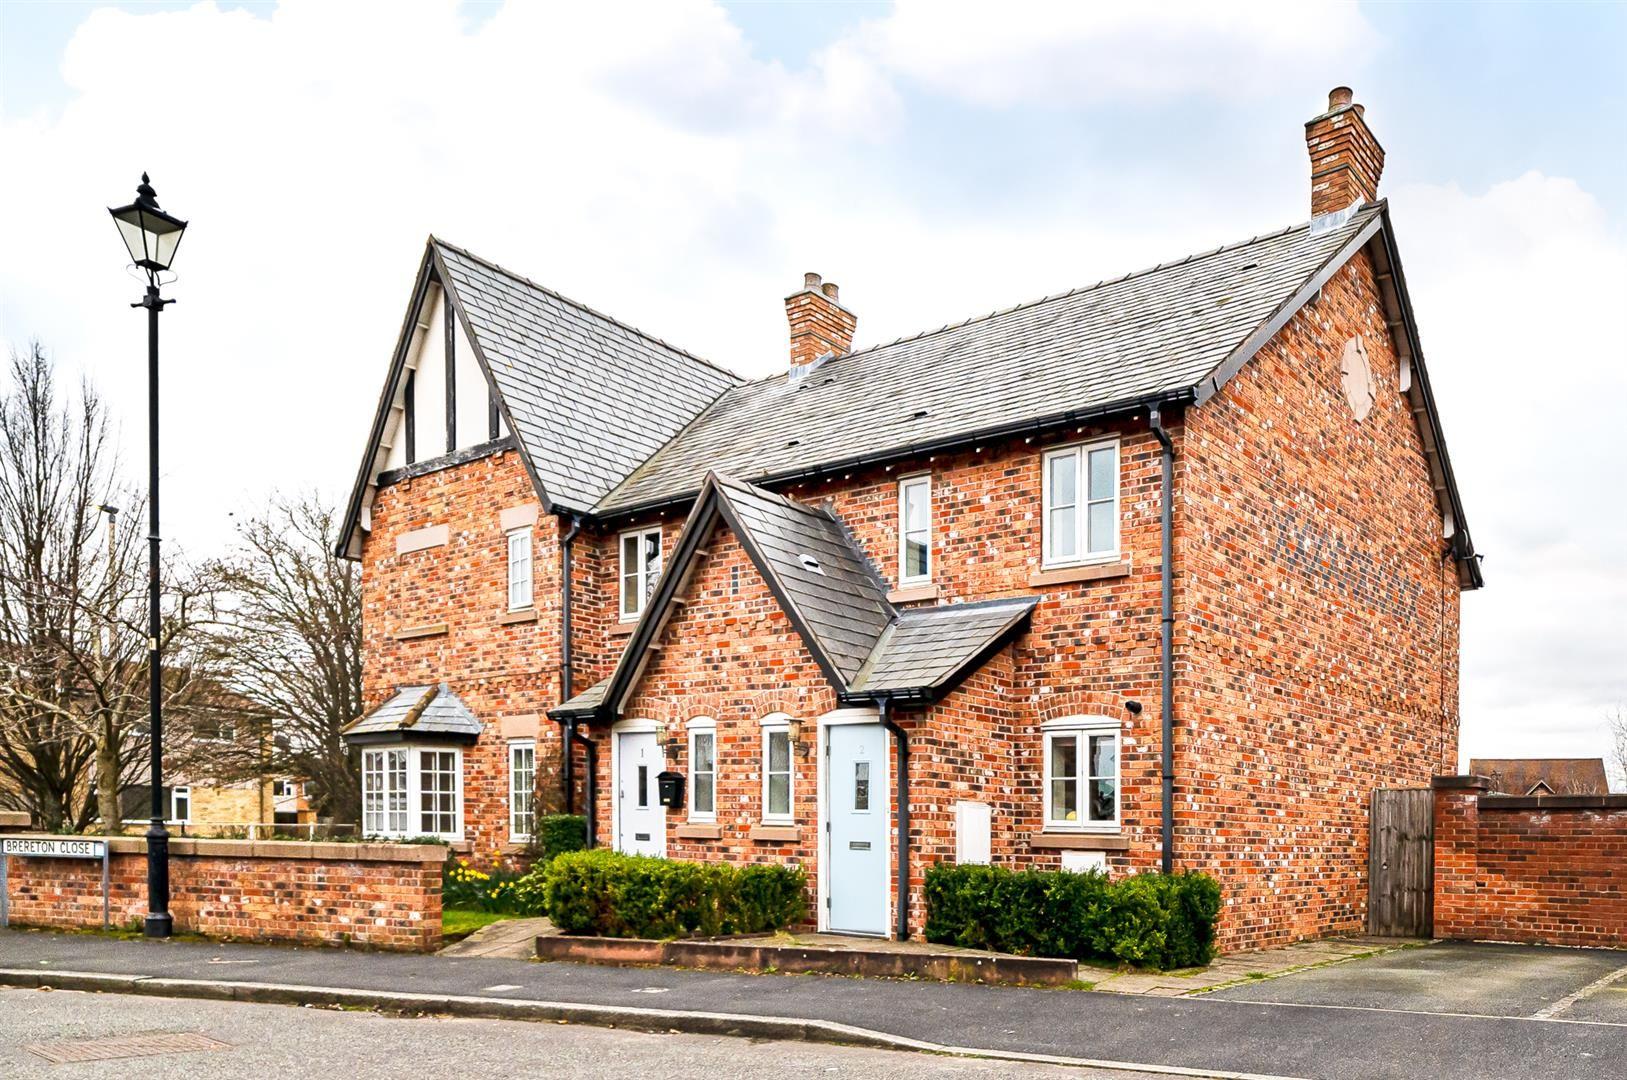 Property photo 1 of 10. Brereton Close Tarvin Chester_-20.Jpg